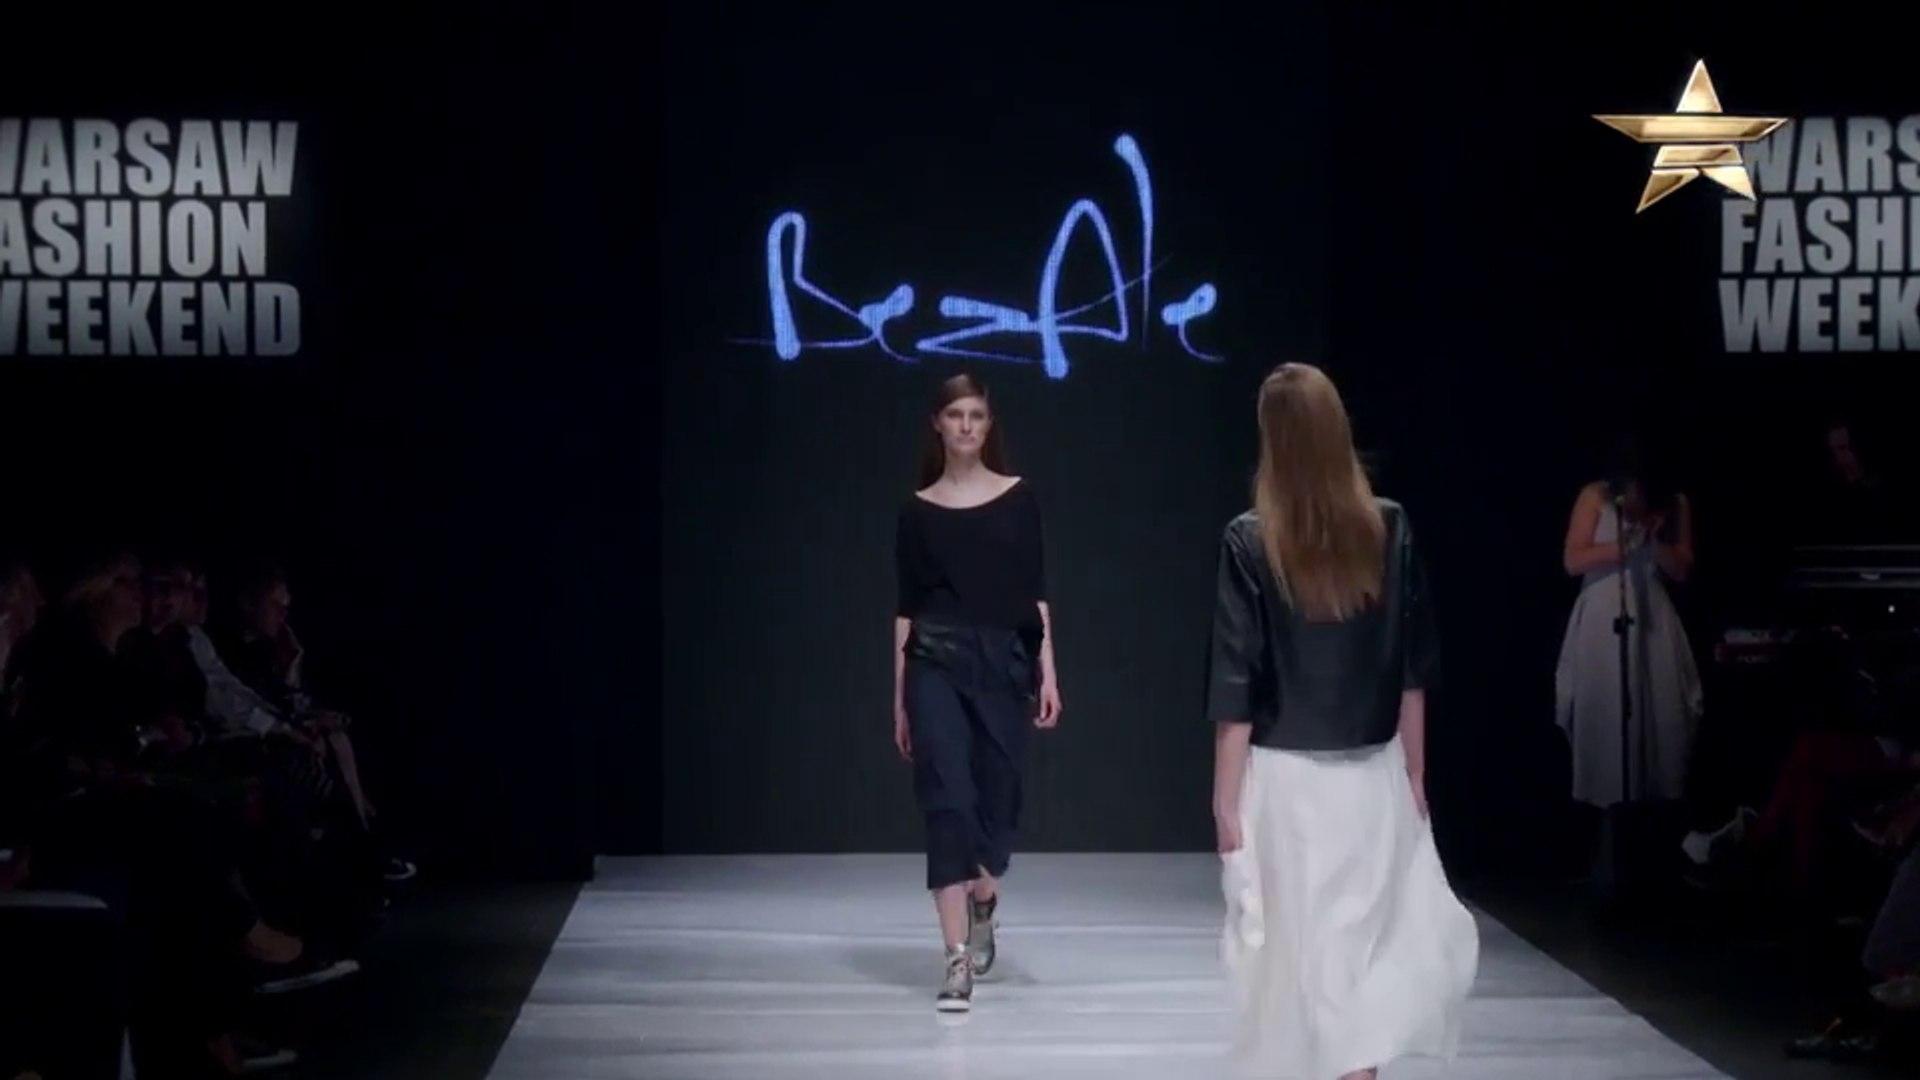 Fashion Week Bezale Warsaw Fashion Weekend 2014